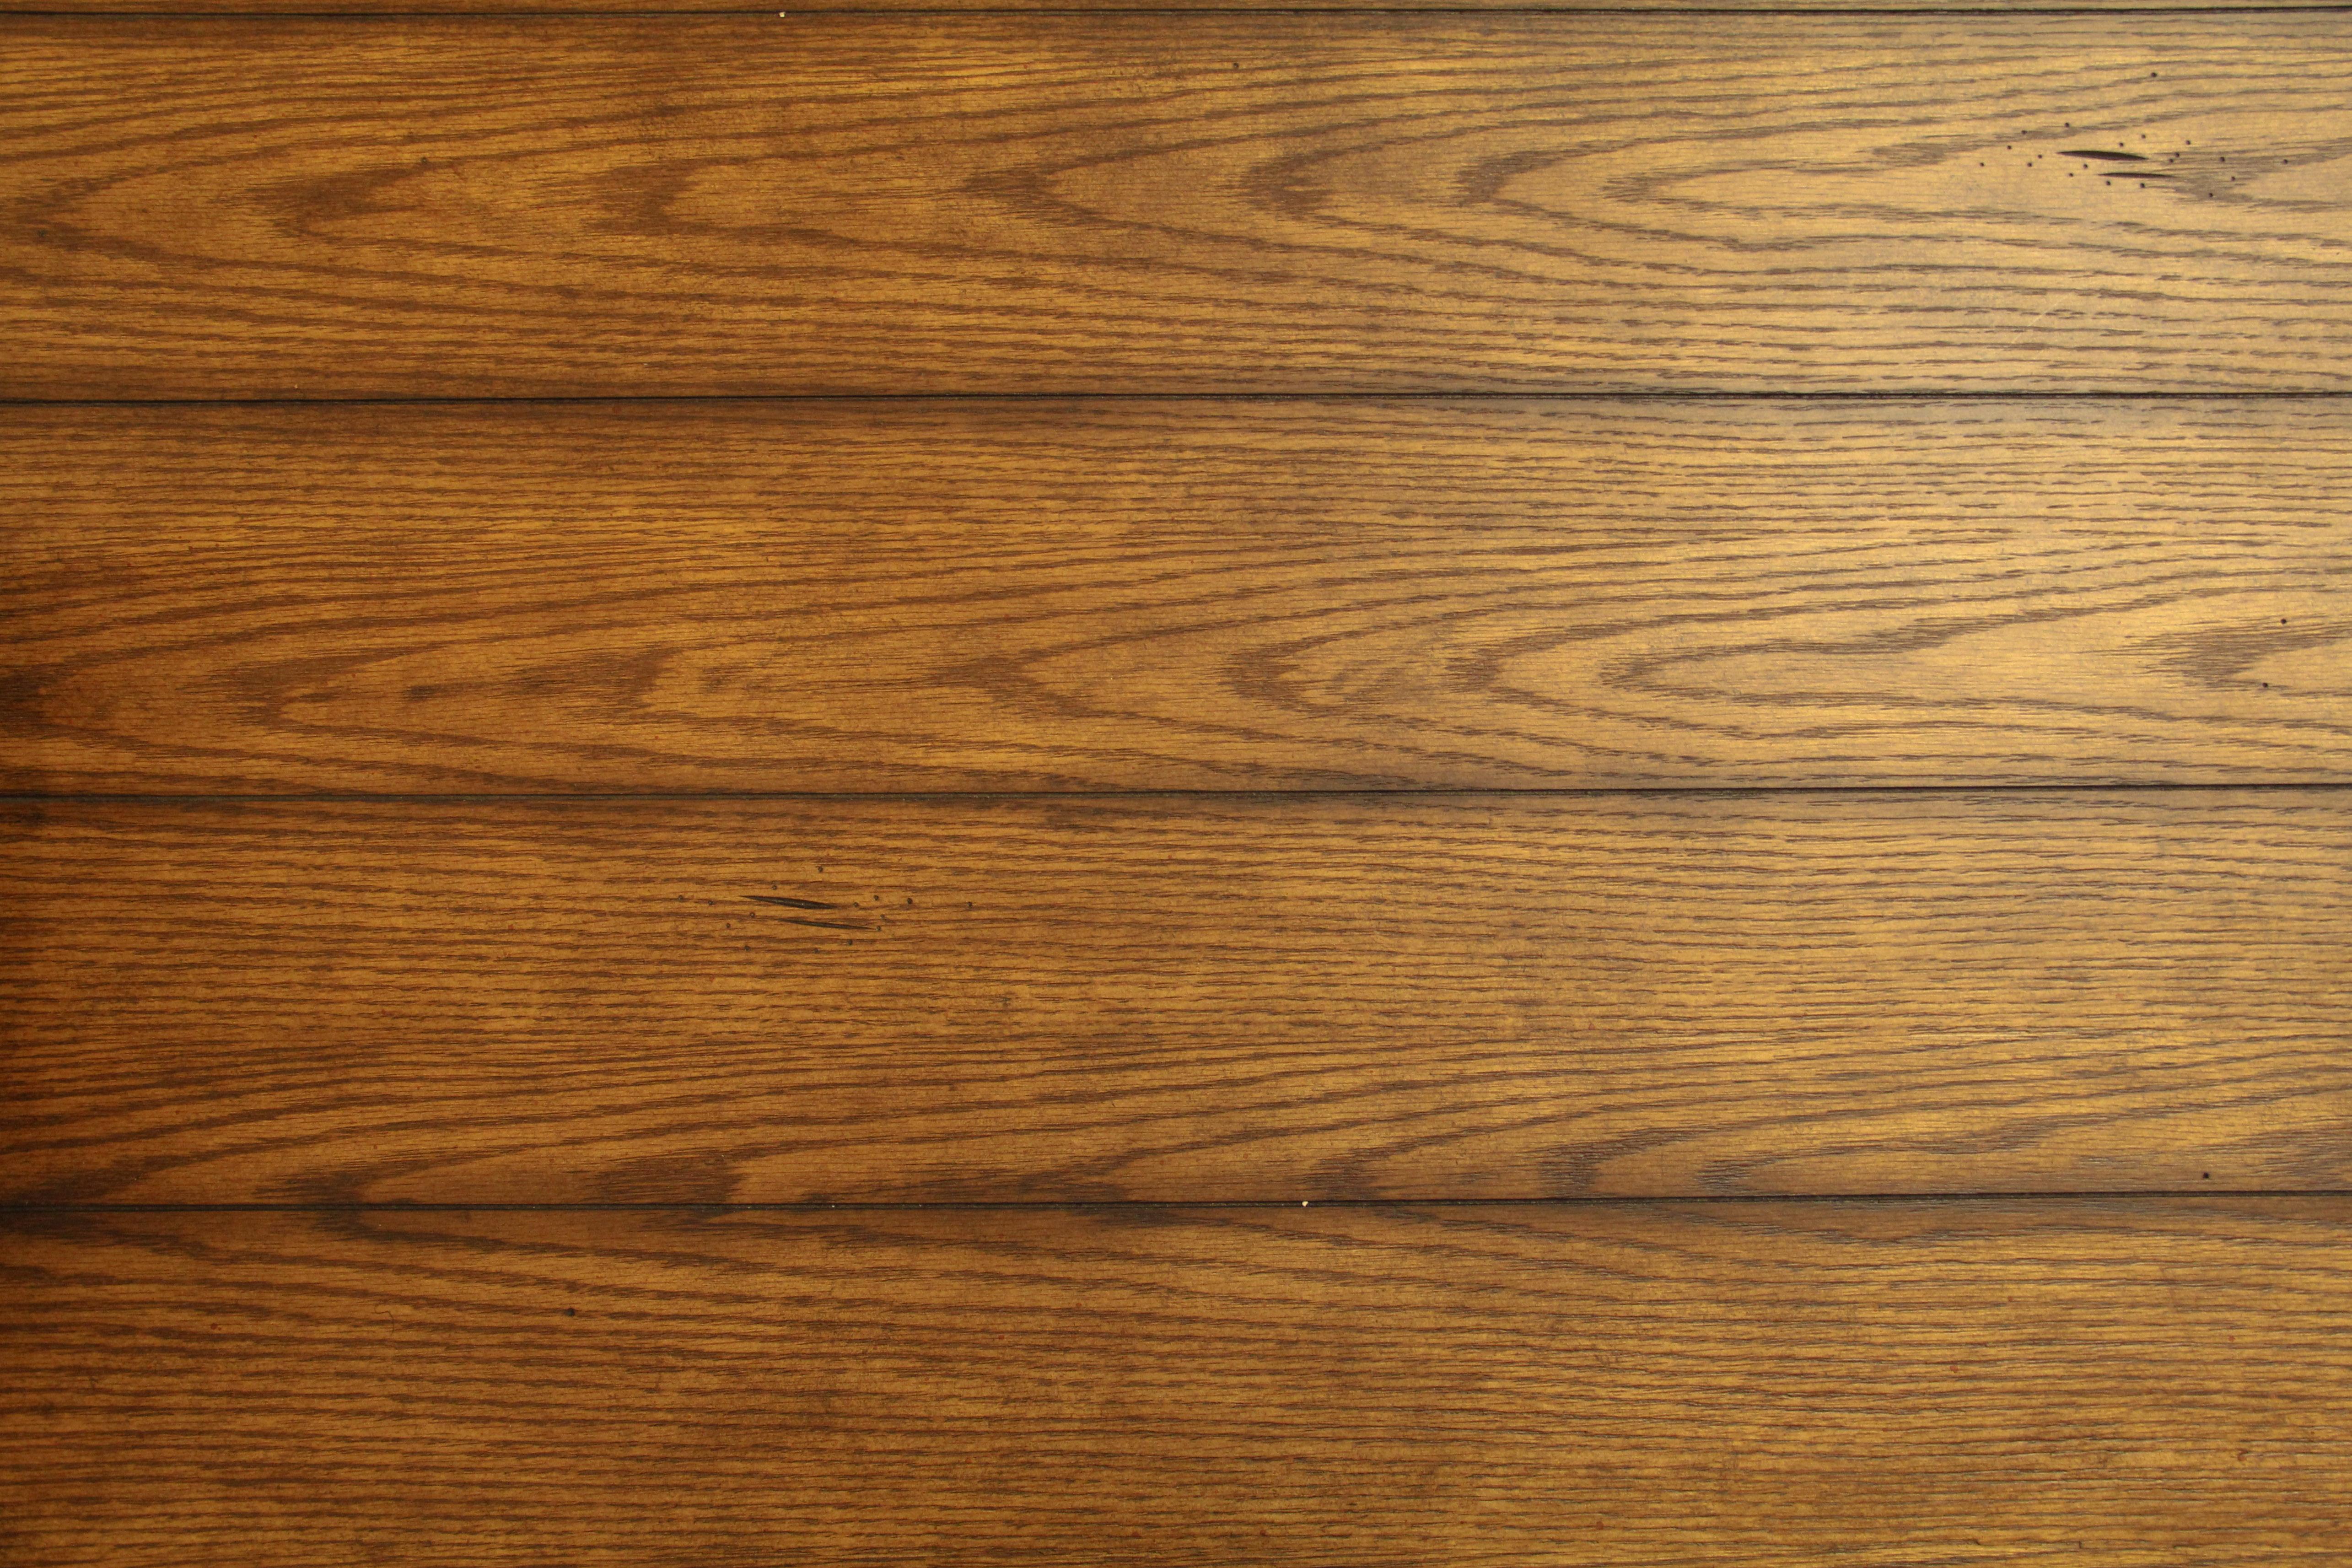 Wood Textures wood texture plank paneling oak brown grain wallpaper 5141x3427